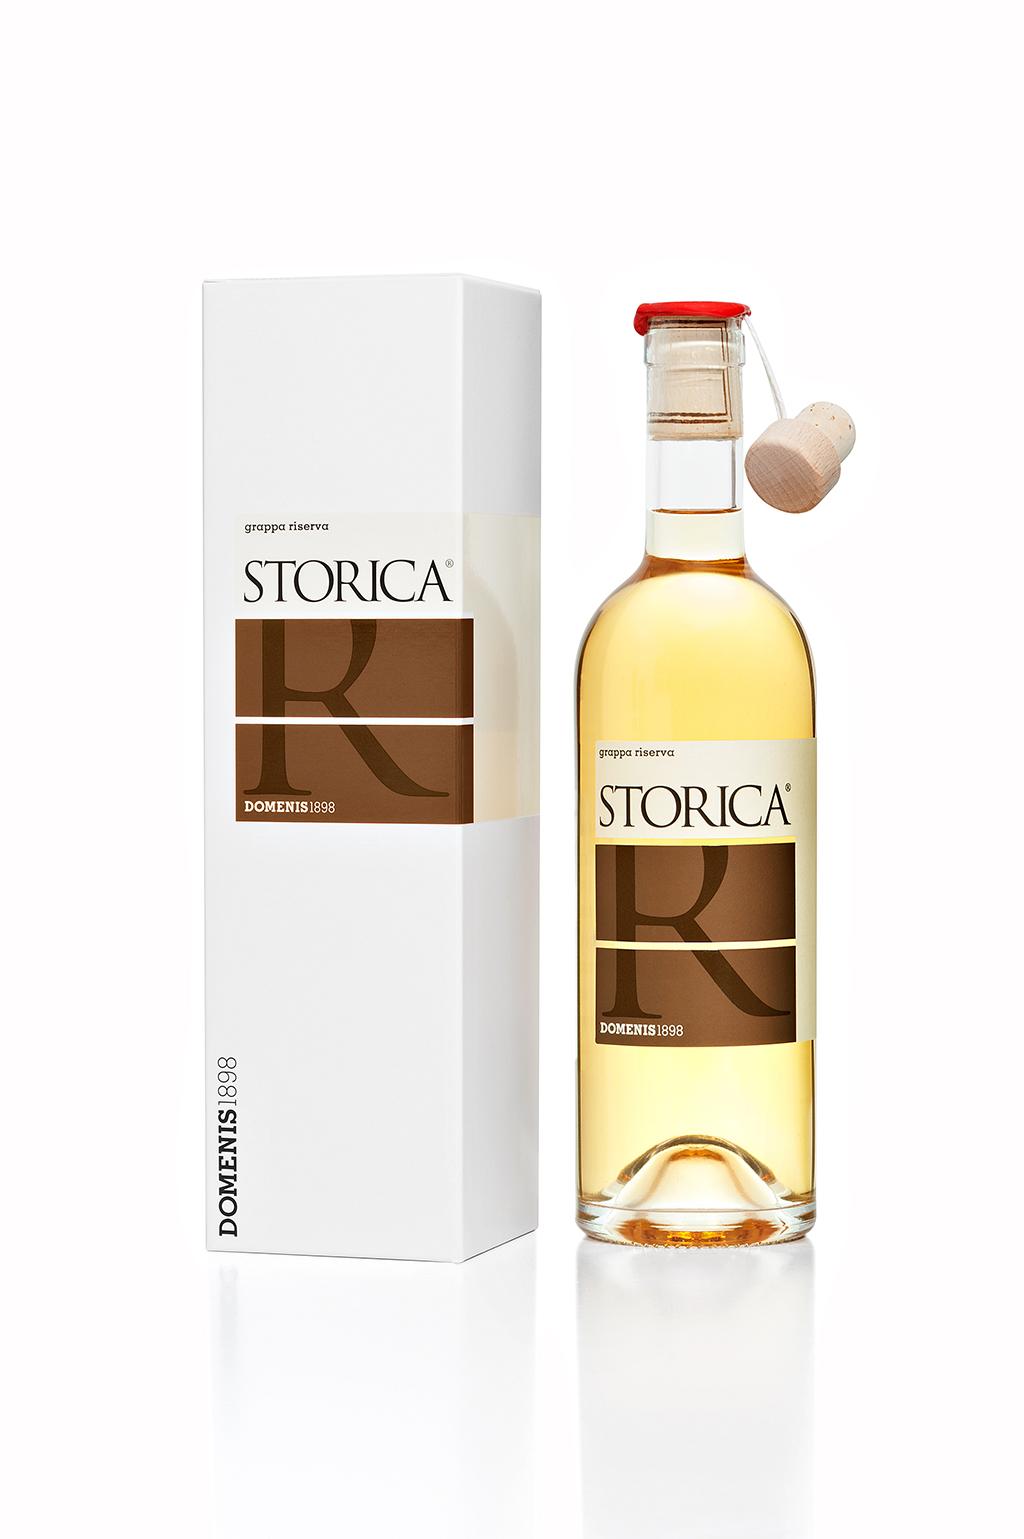 Domenis_Storica_Gruppo_B